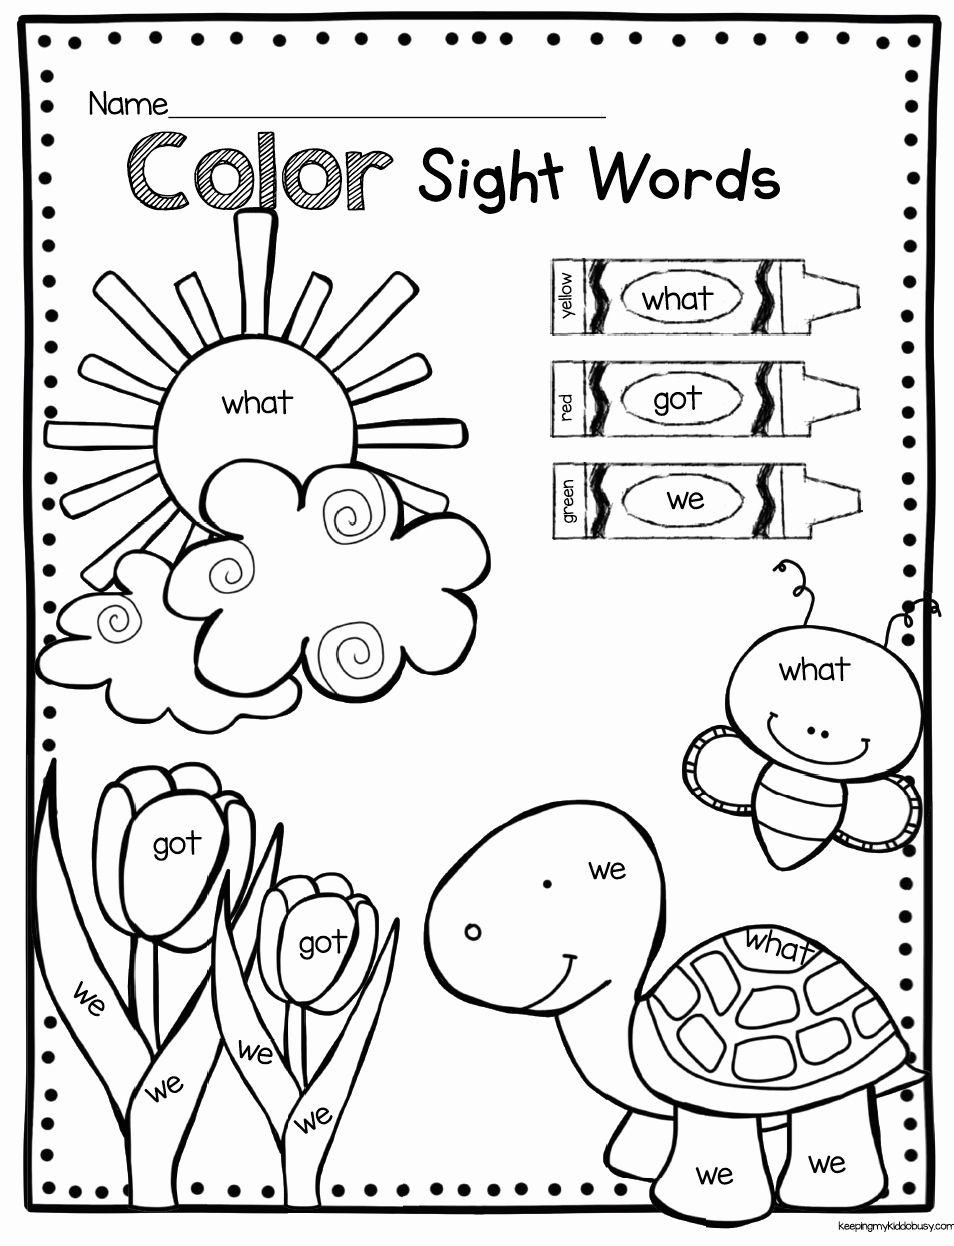 Color Words Coloring Sheet Sight words kindergarten